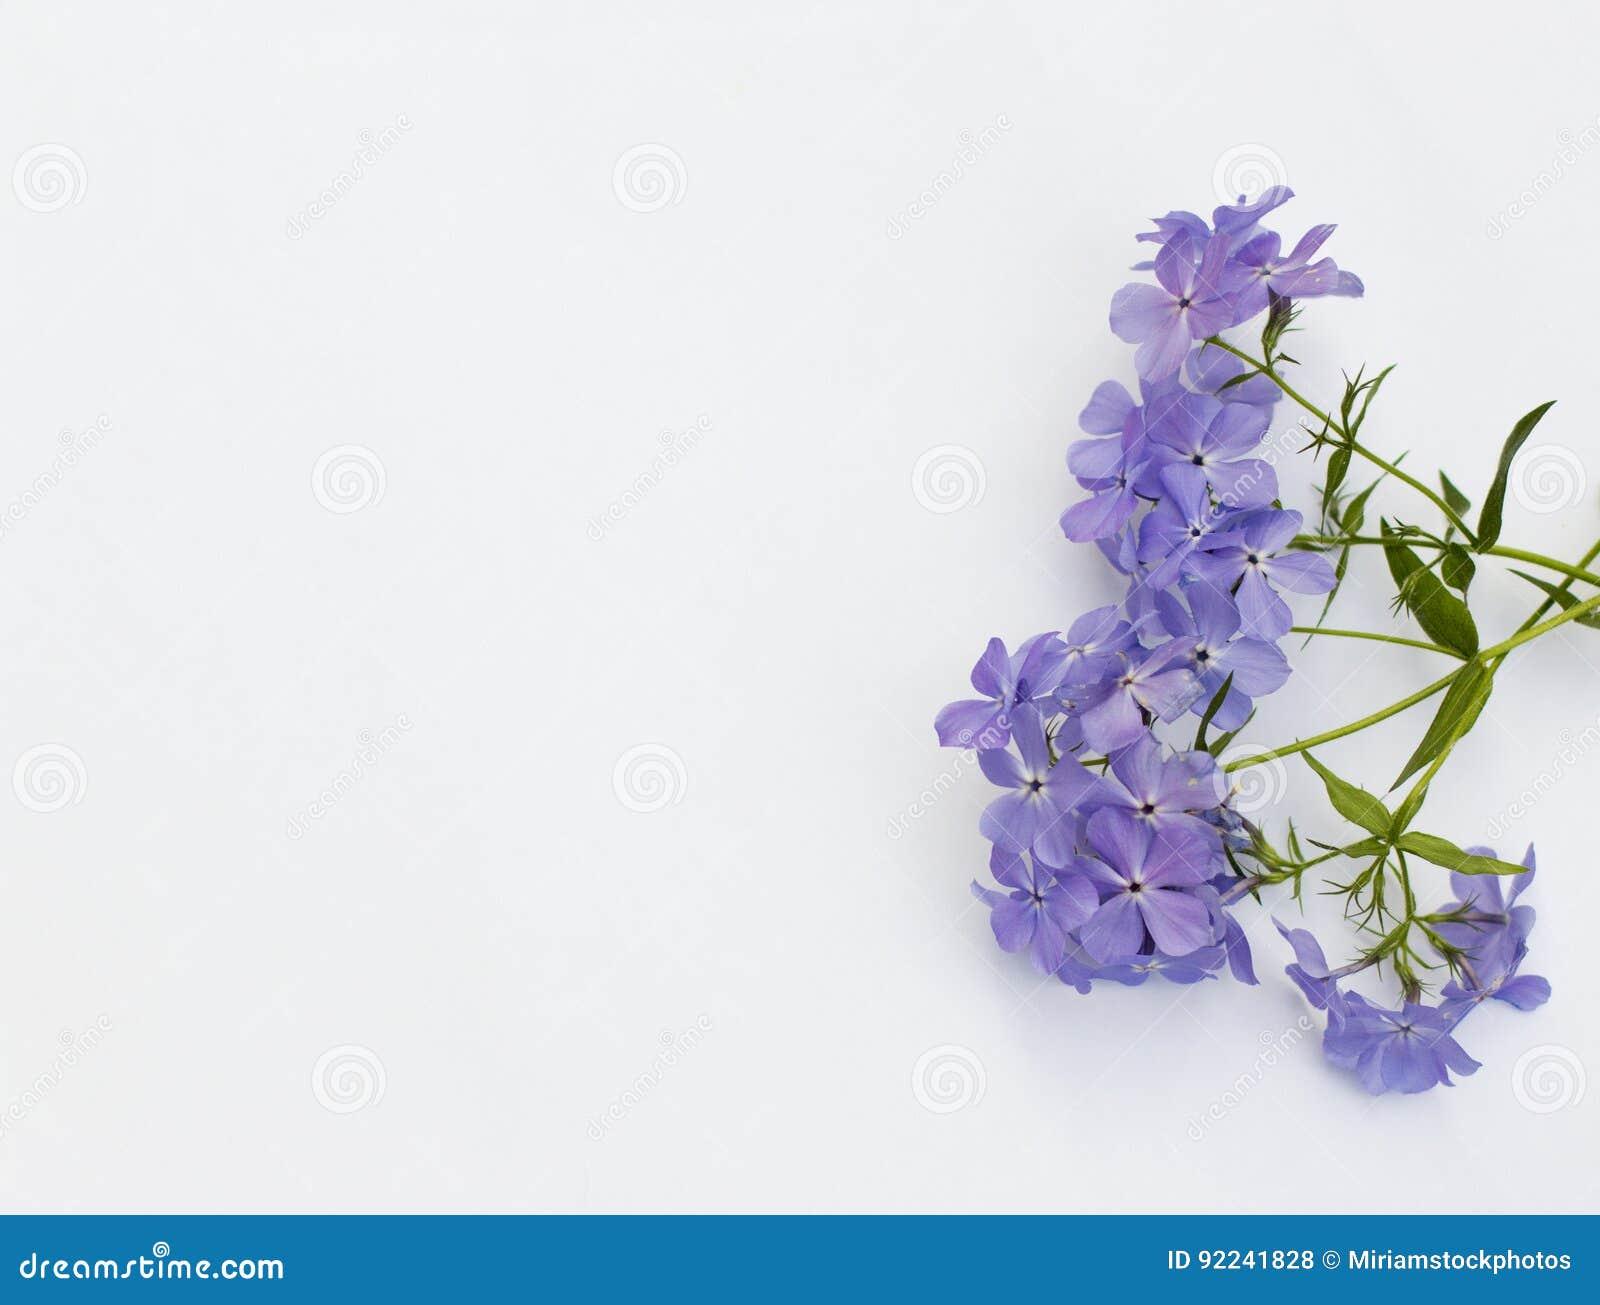 Phlox Blue Moon Flowers Stock Photo Image Of Bouquet 92241828